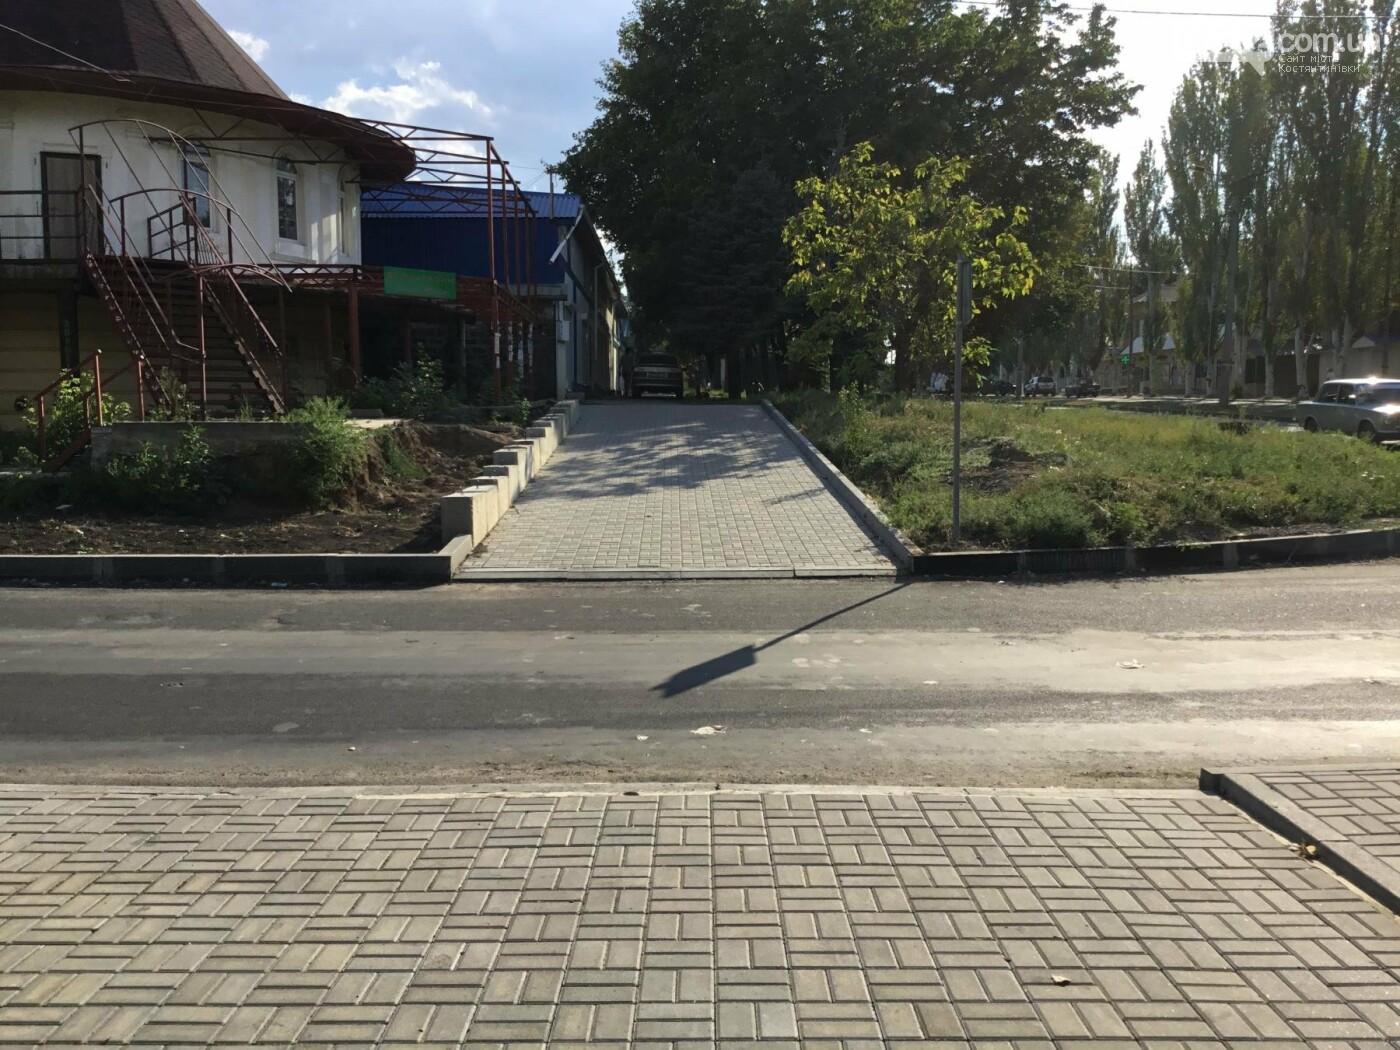 Дорога после ремонта по ул. Леваневского в Константиновке, фото-13